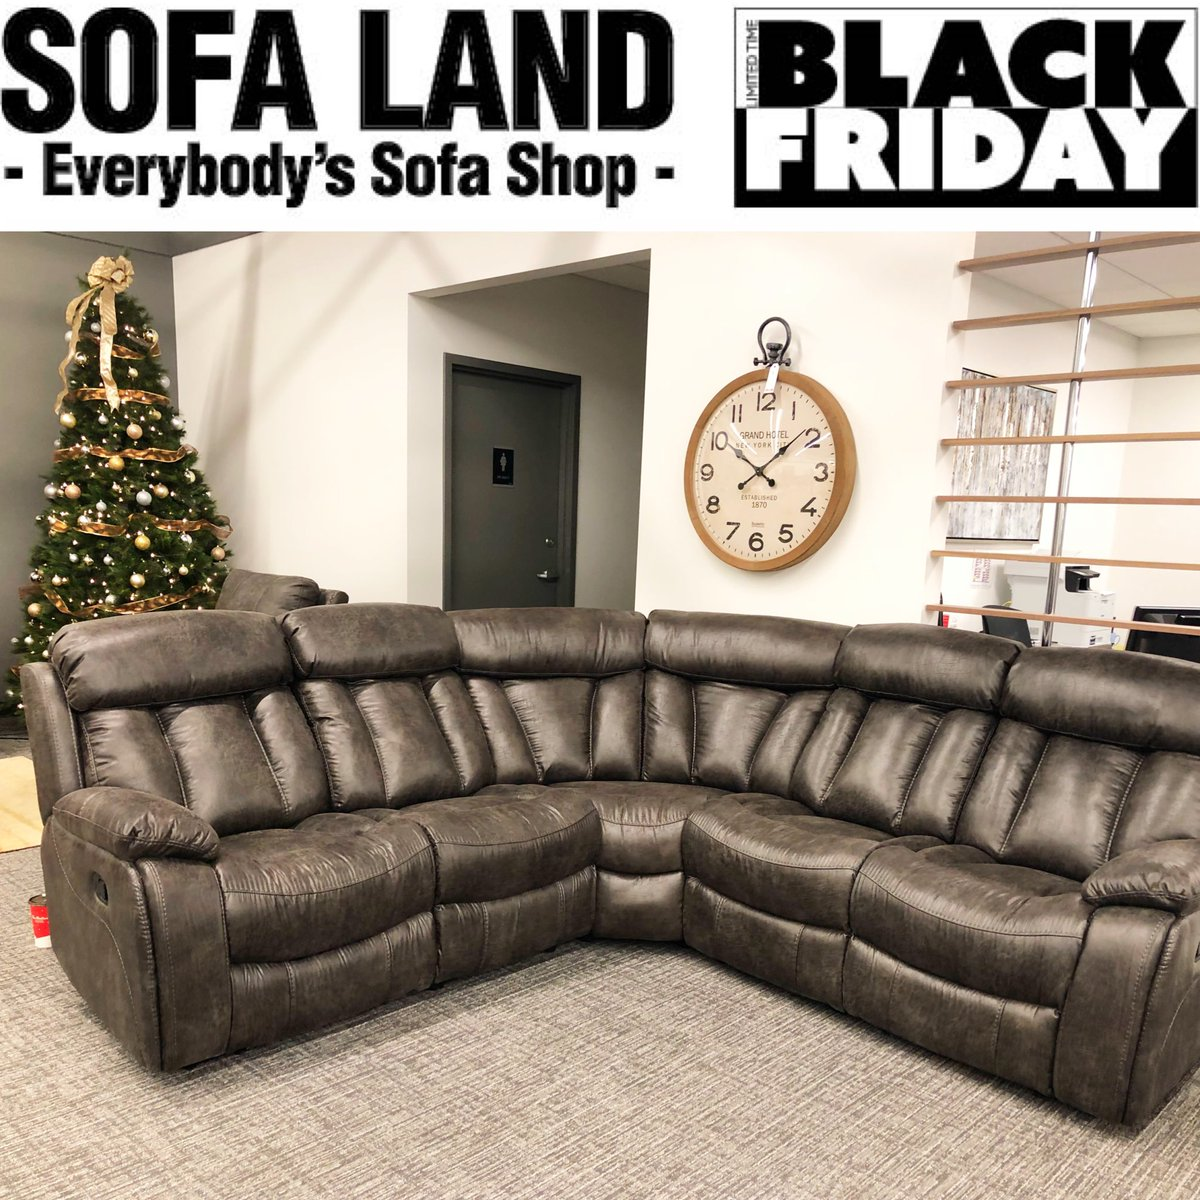 sofaland spain patio sofa cushions hashtag on twitter 0 replies retweets likes